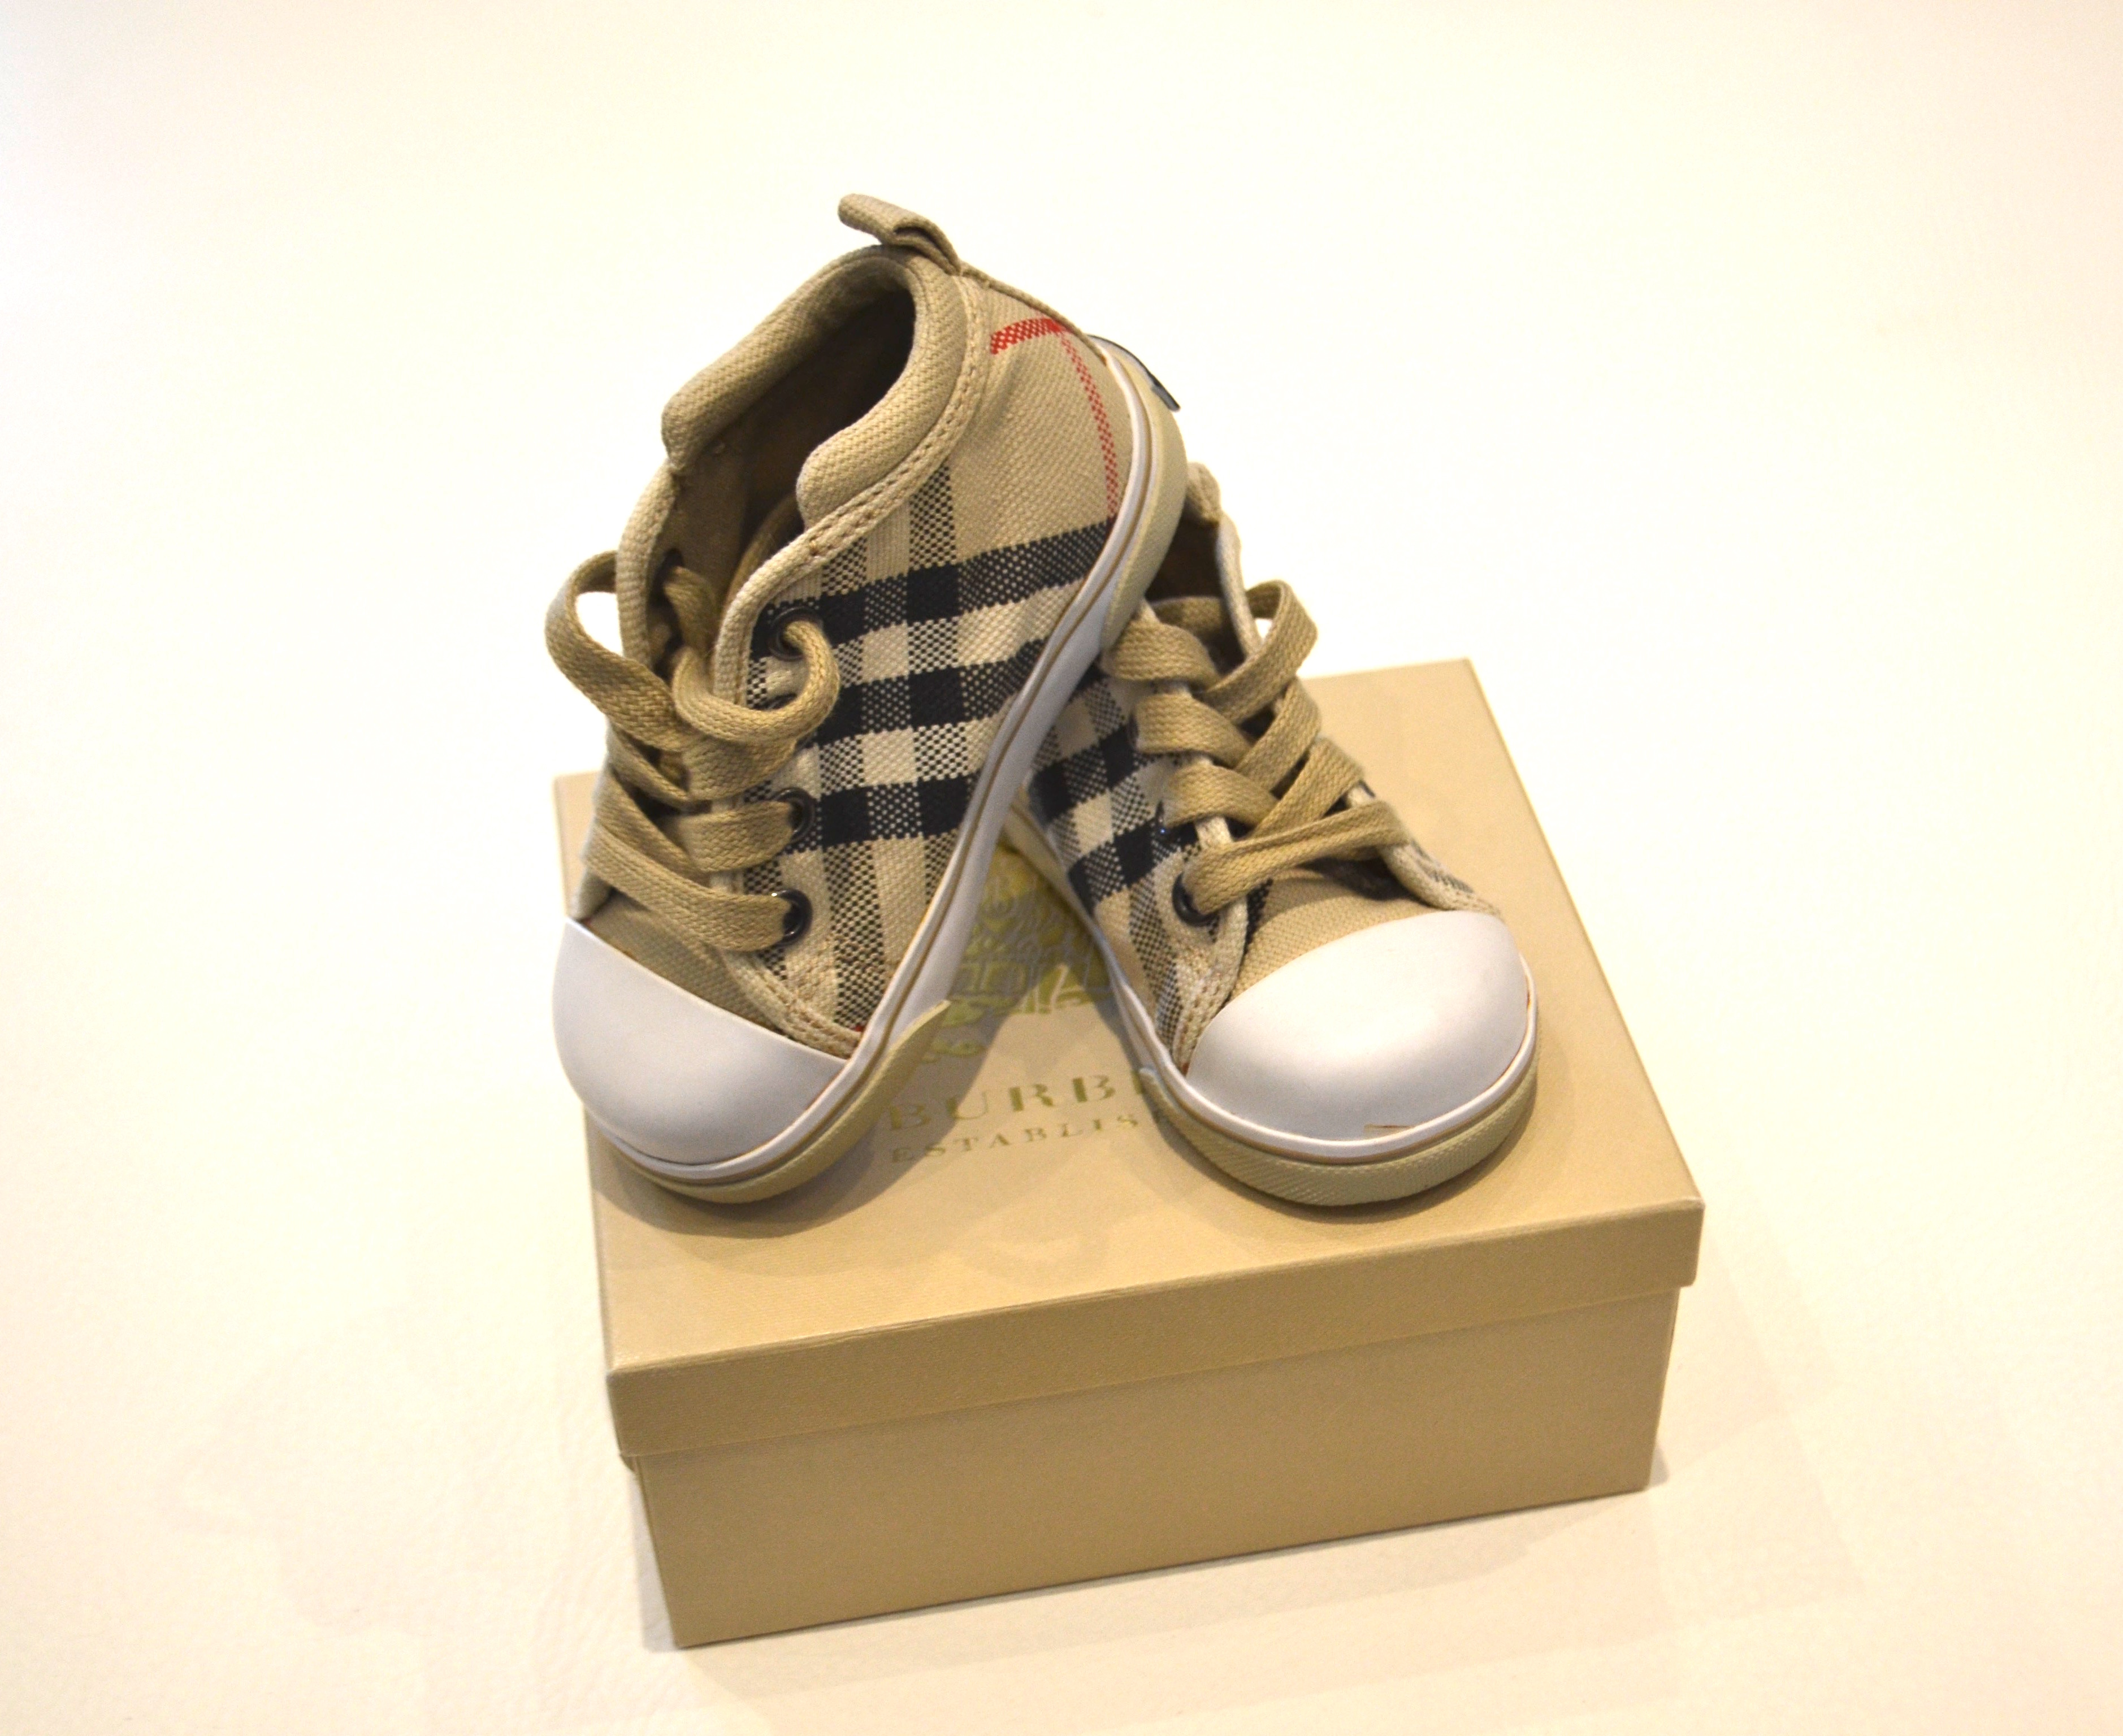 Acheter chaussure burberry bebe pas cher e74bead0826f